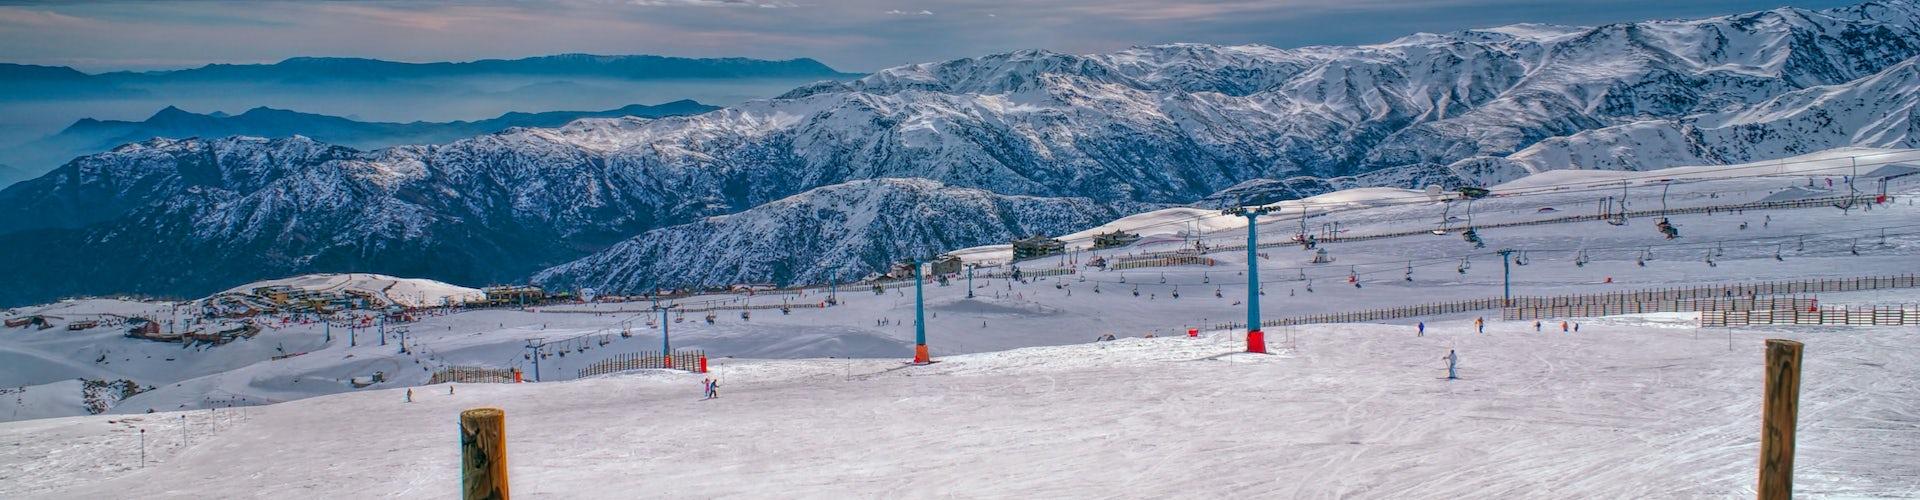 Valle Nevado Pistas Adobestock 77154966